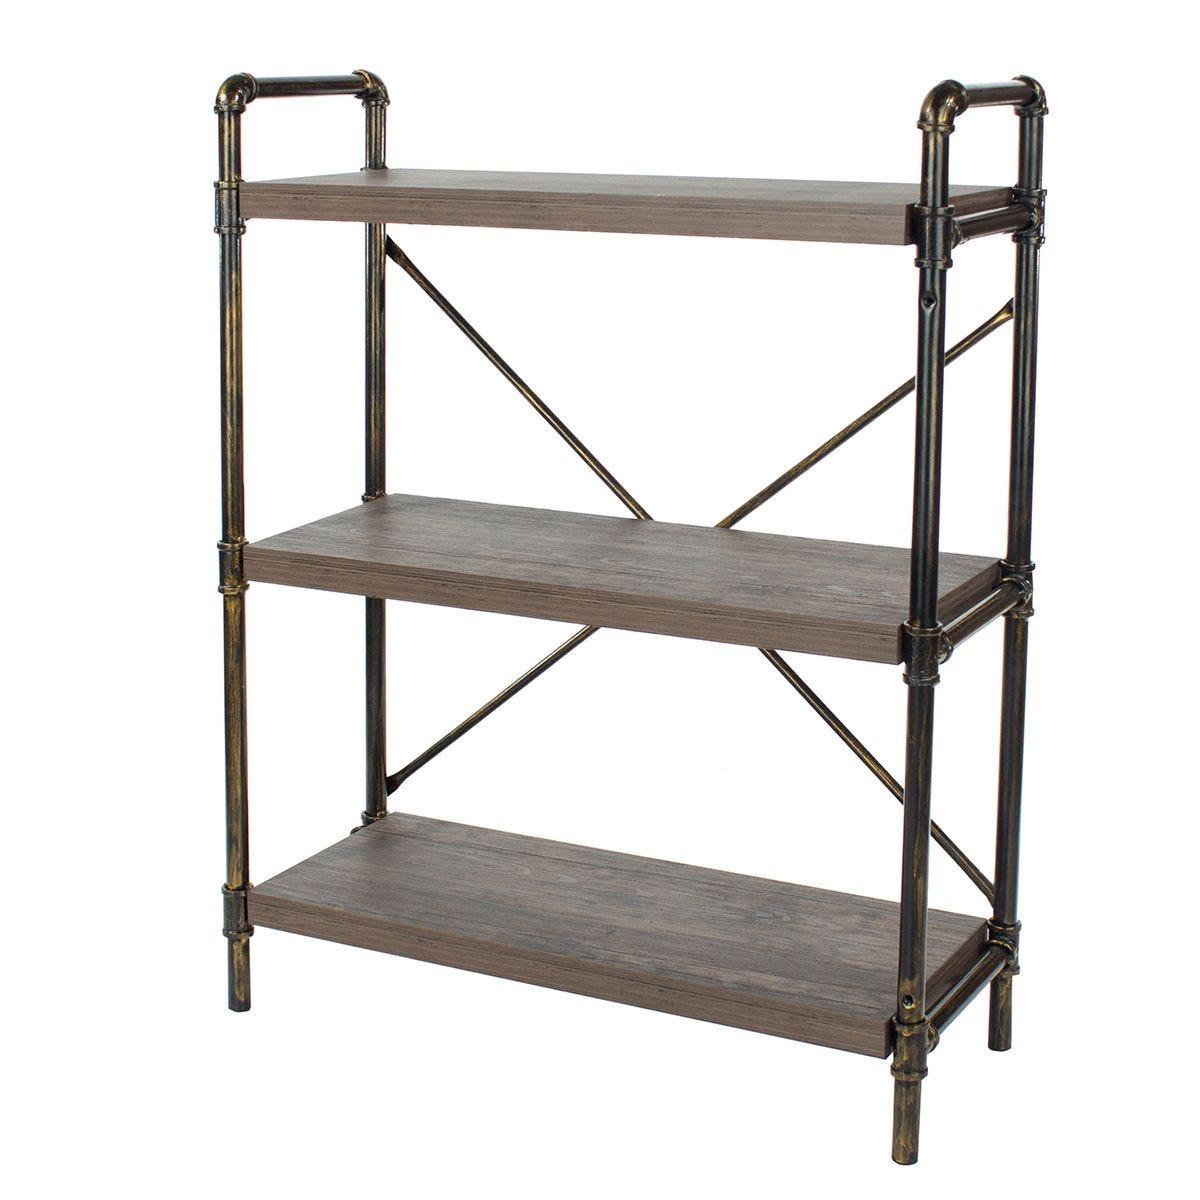 Gela Loft 3 Tier Bookshelf with Pipe Design Uprights